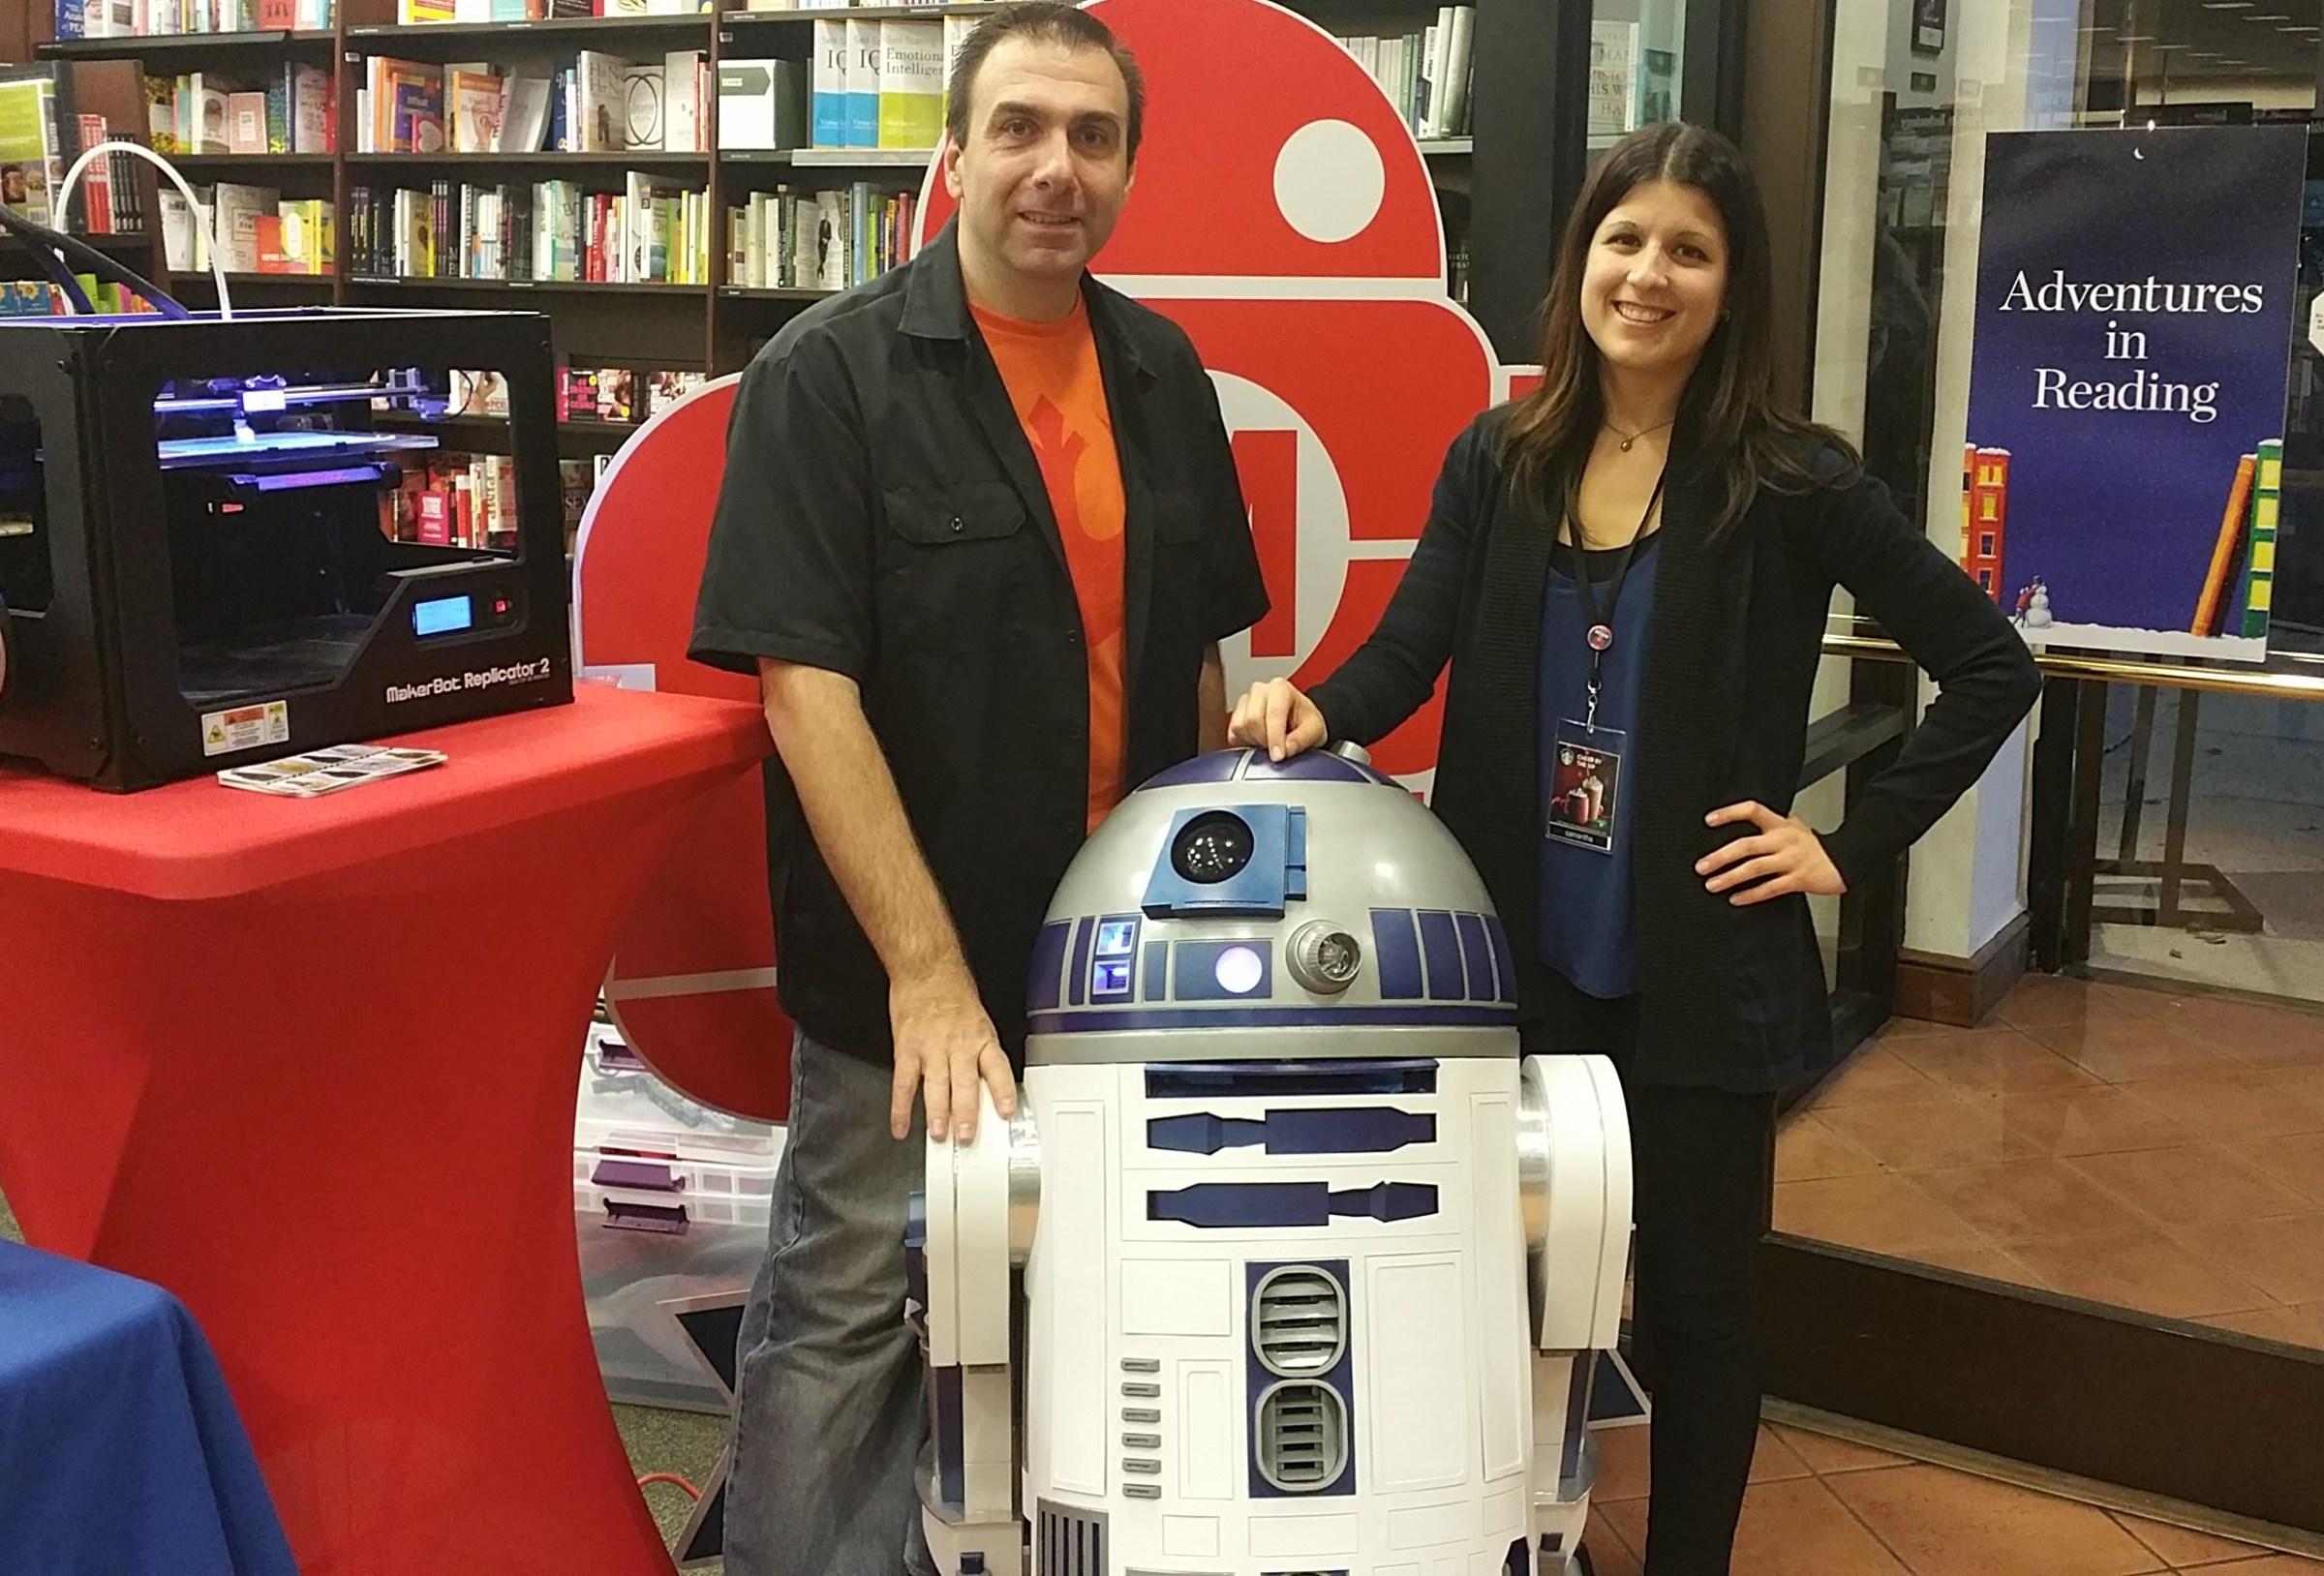 Barnes & Noble Mini Maker Faire Coming to a Store Near You!